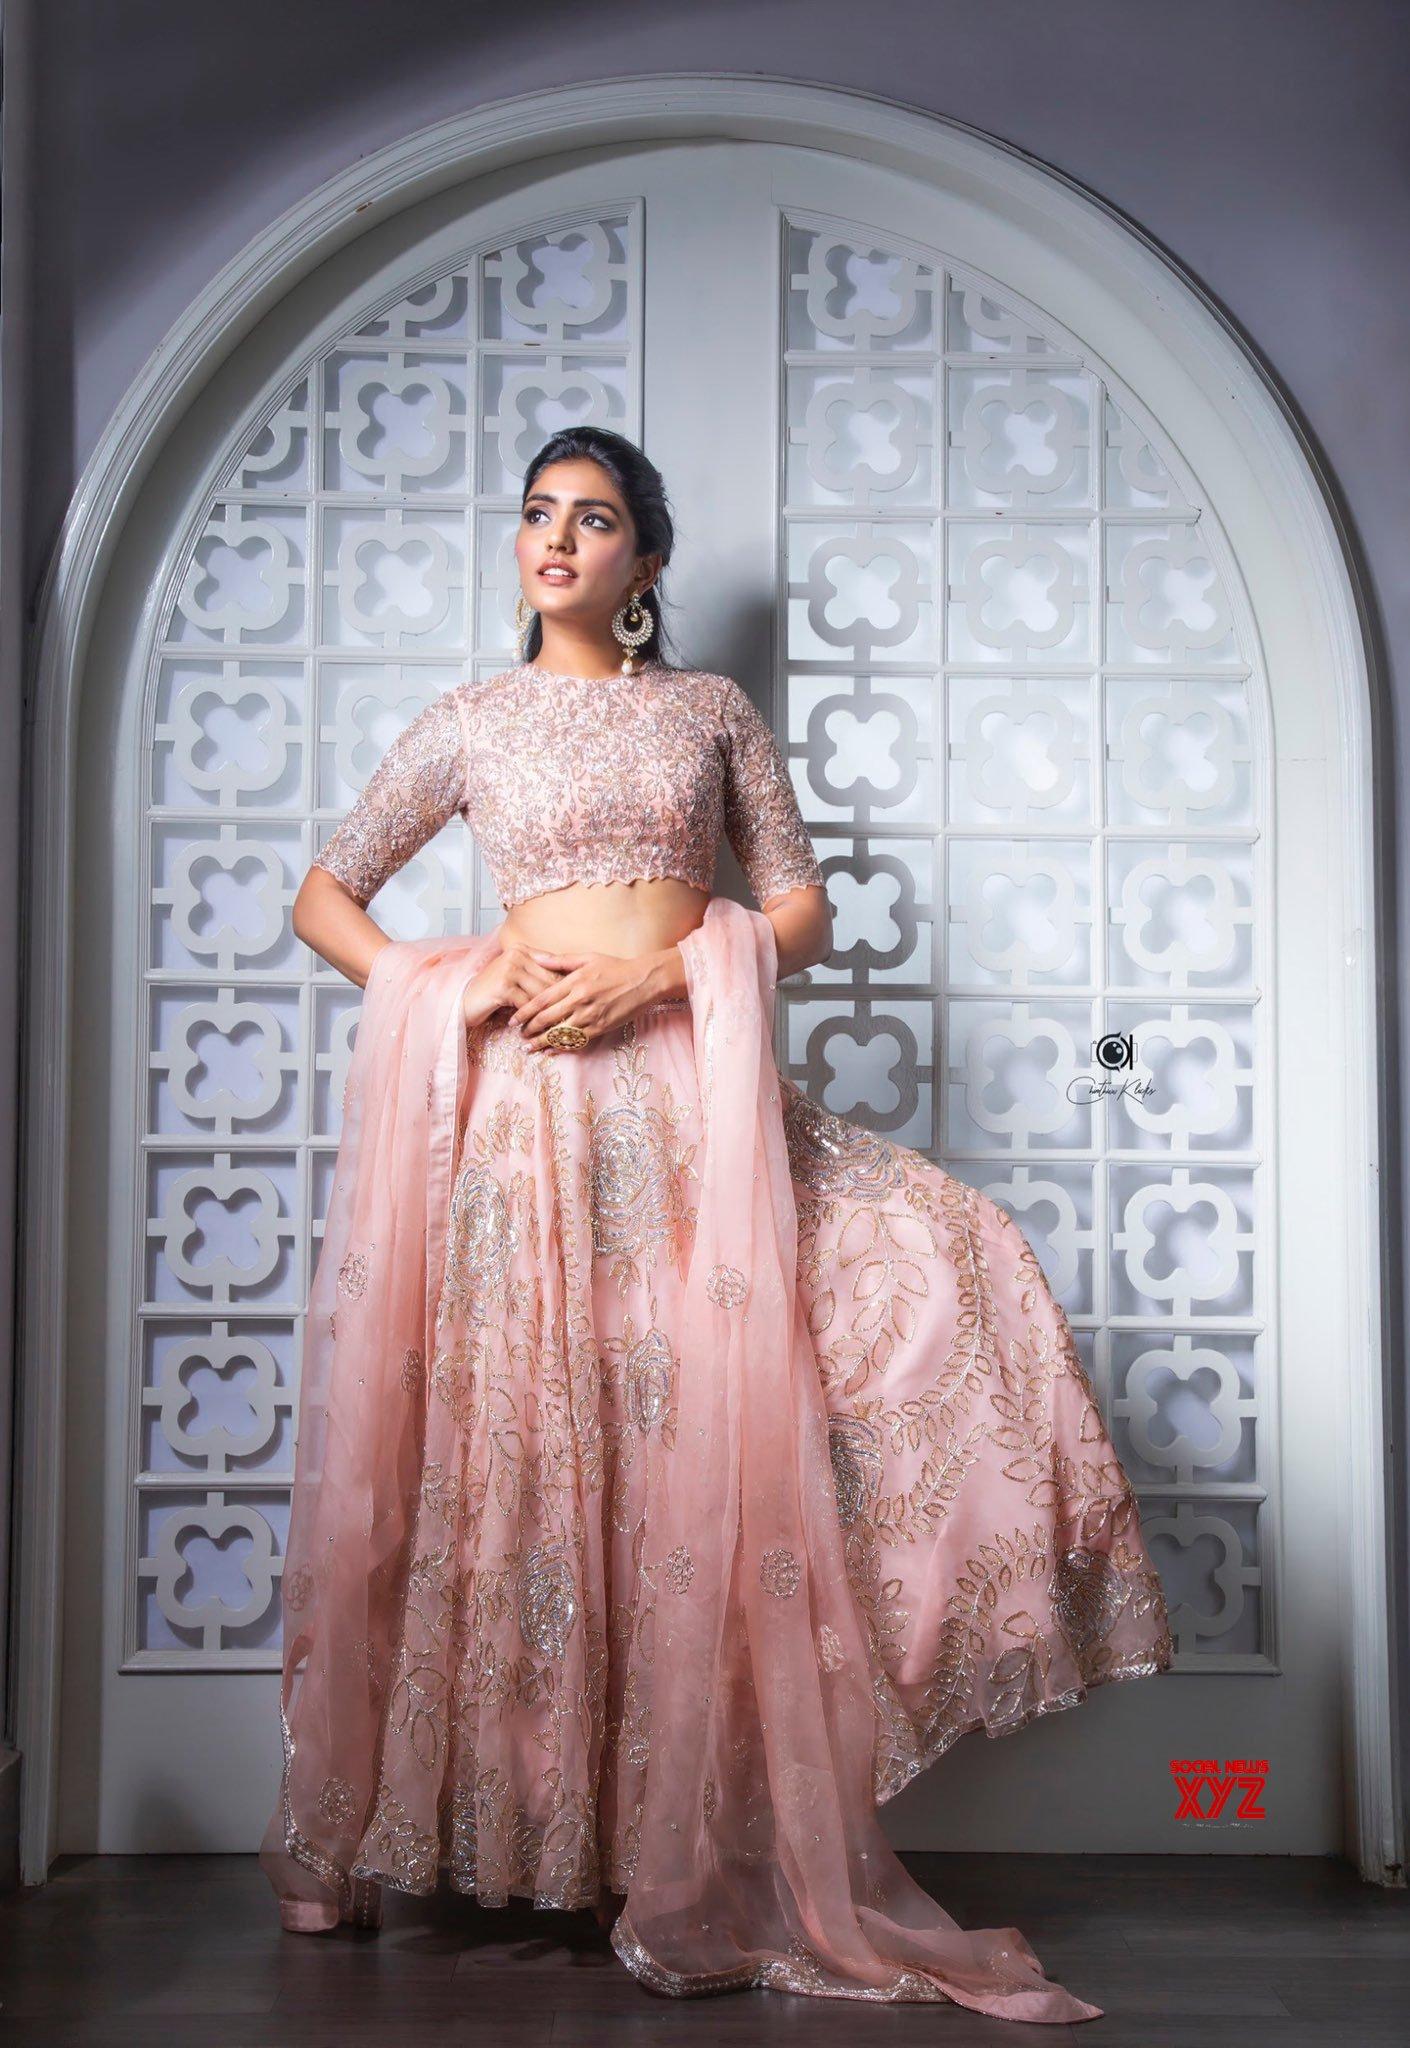 Actress Eesha Rebba Stunning New Stills